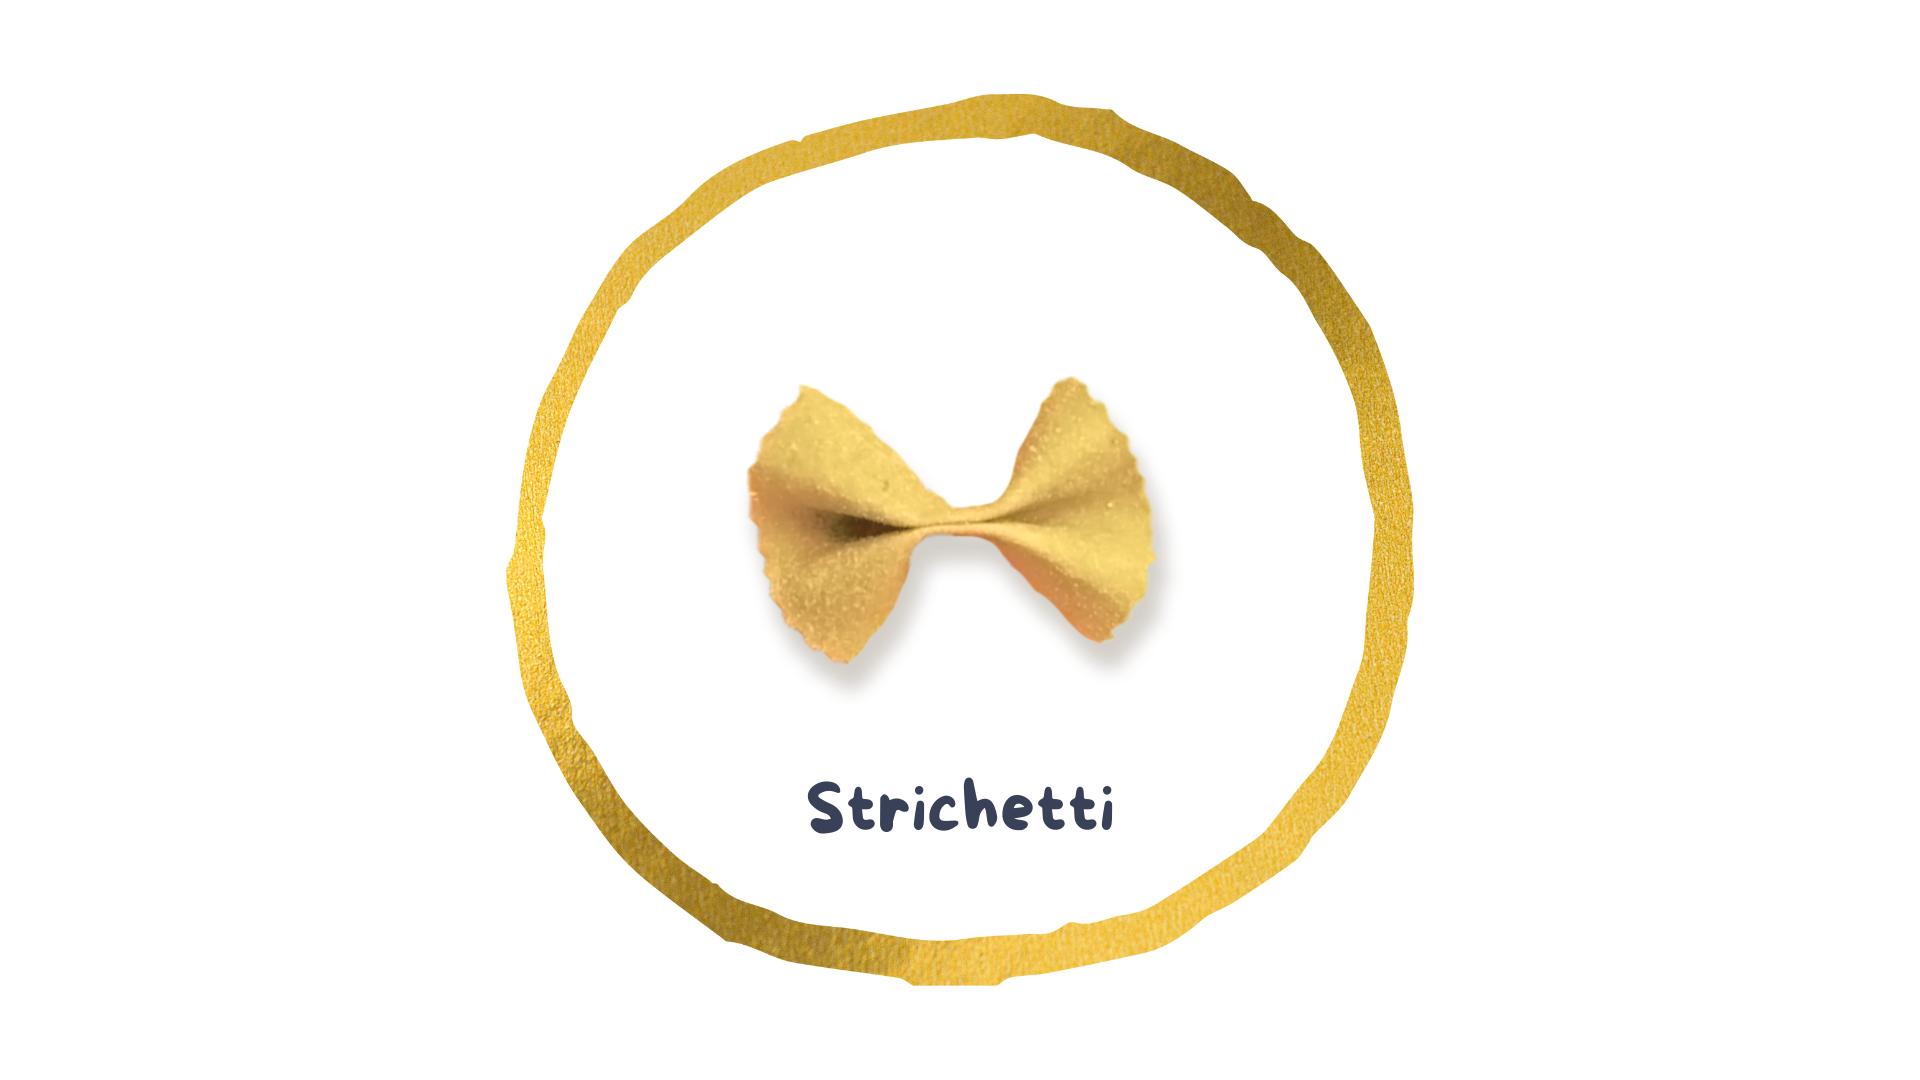 strichetti